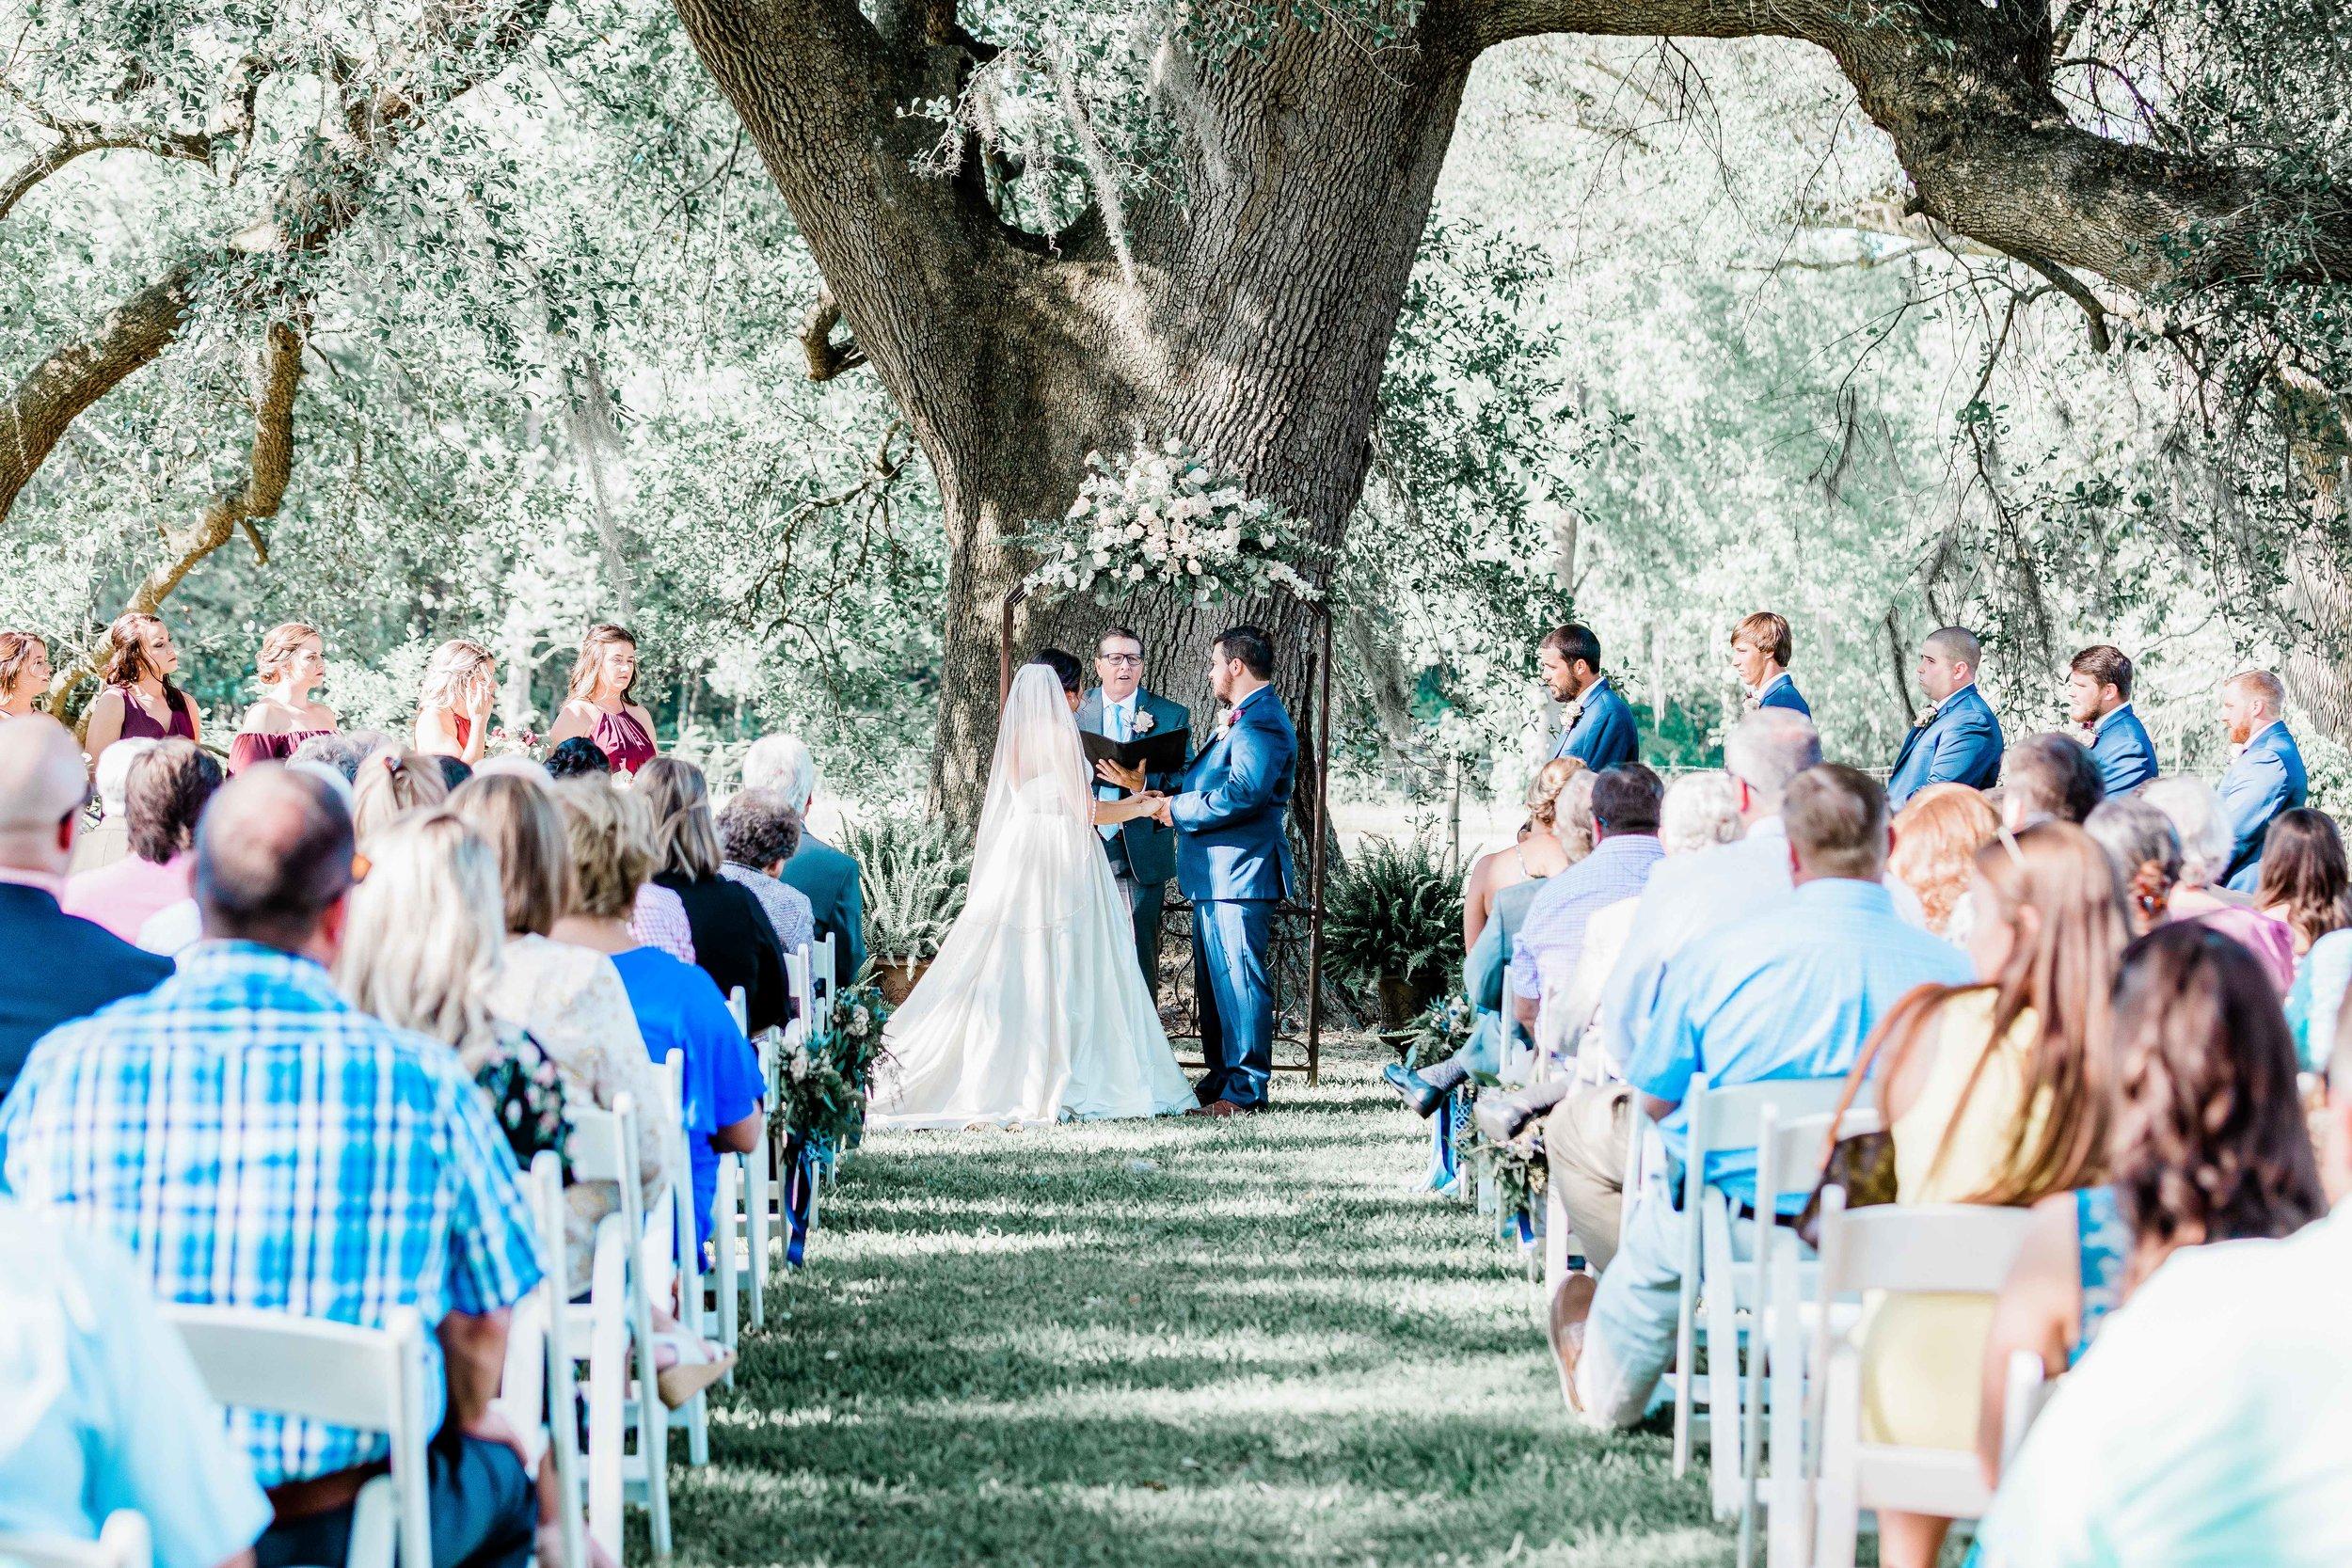 20190427-Southern Lens Photography- Savannah Wedding Photographer-Screven and Caroline-201965.jpg